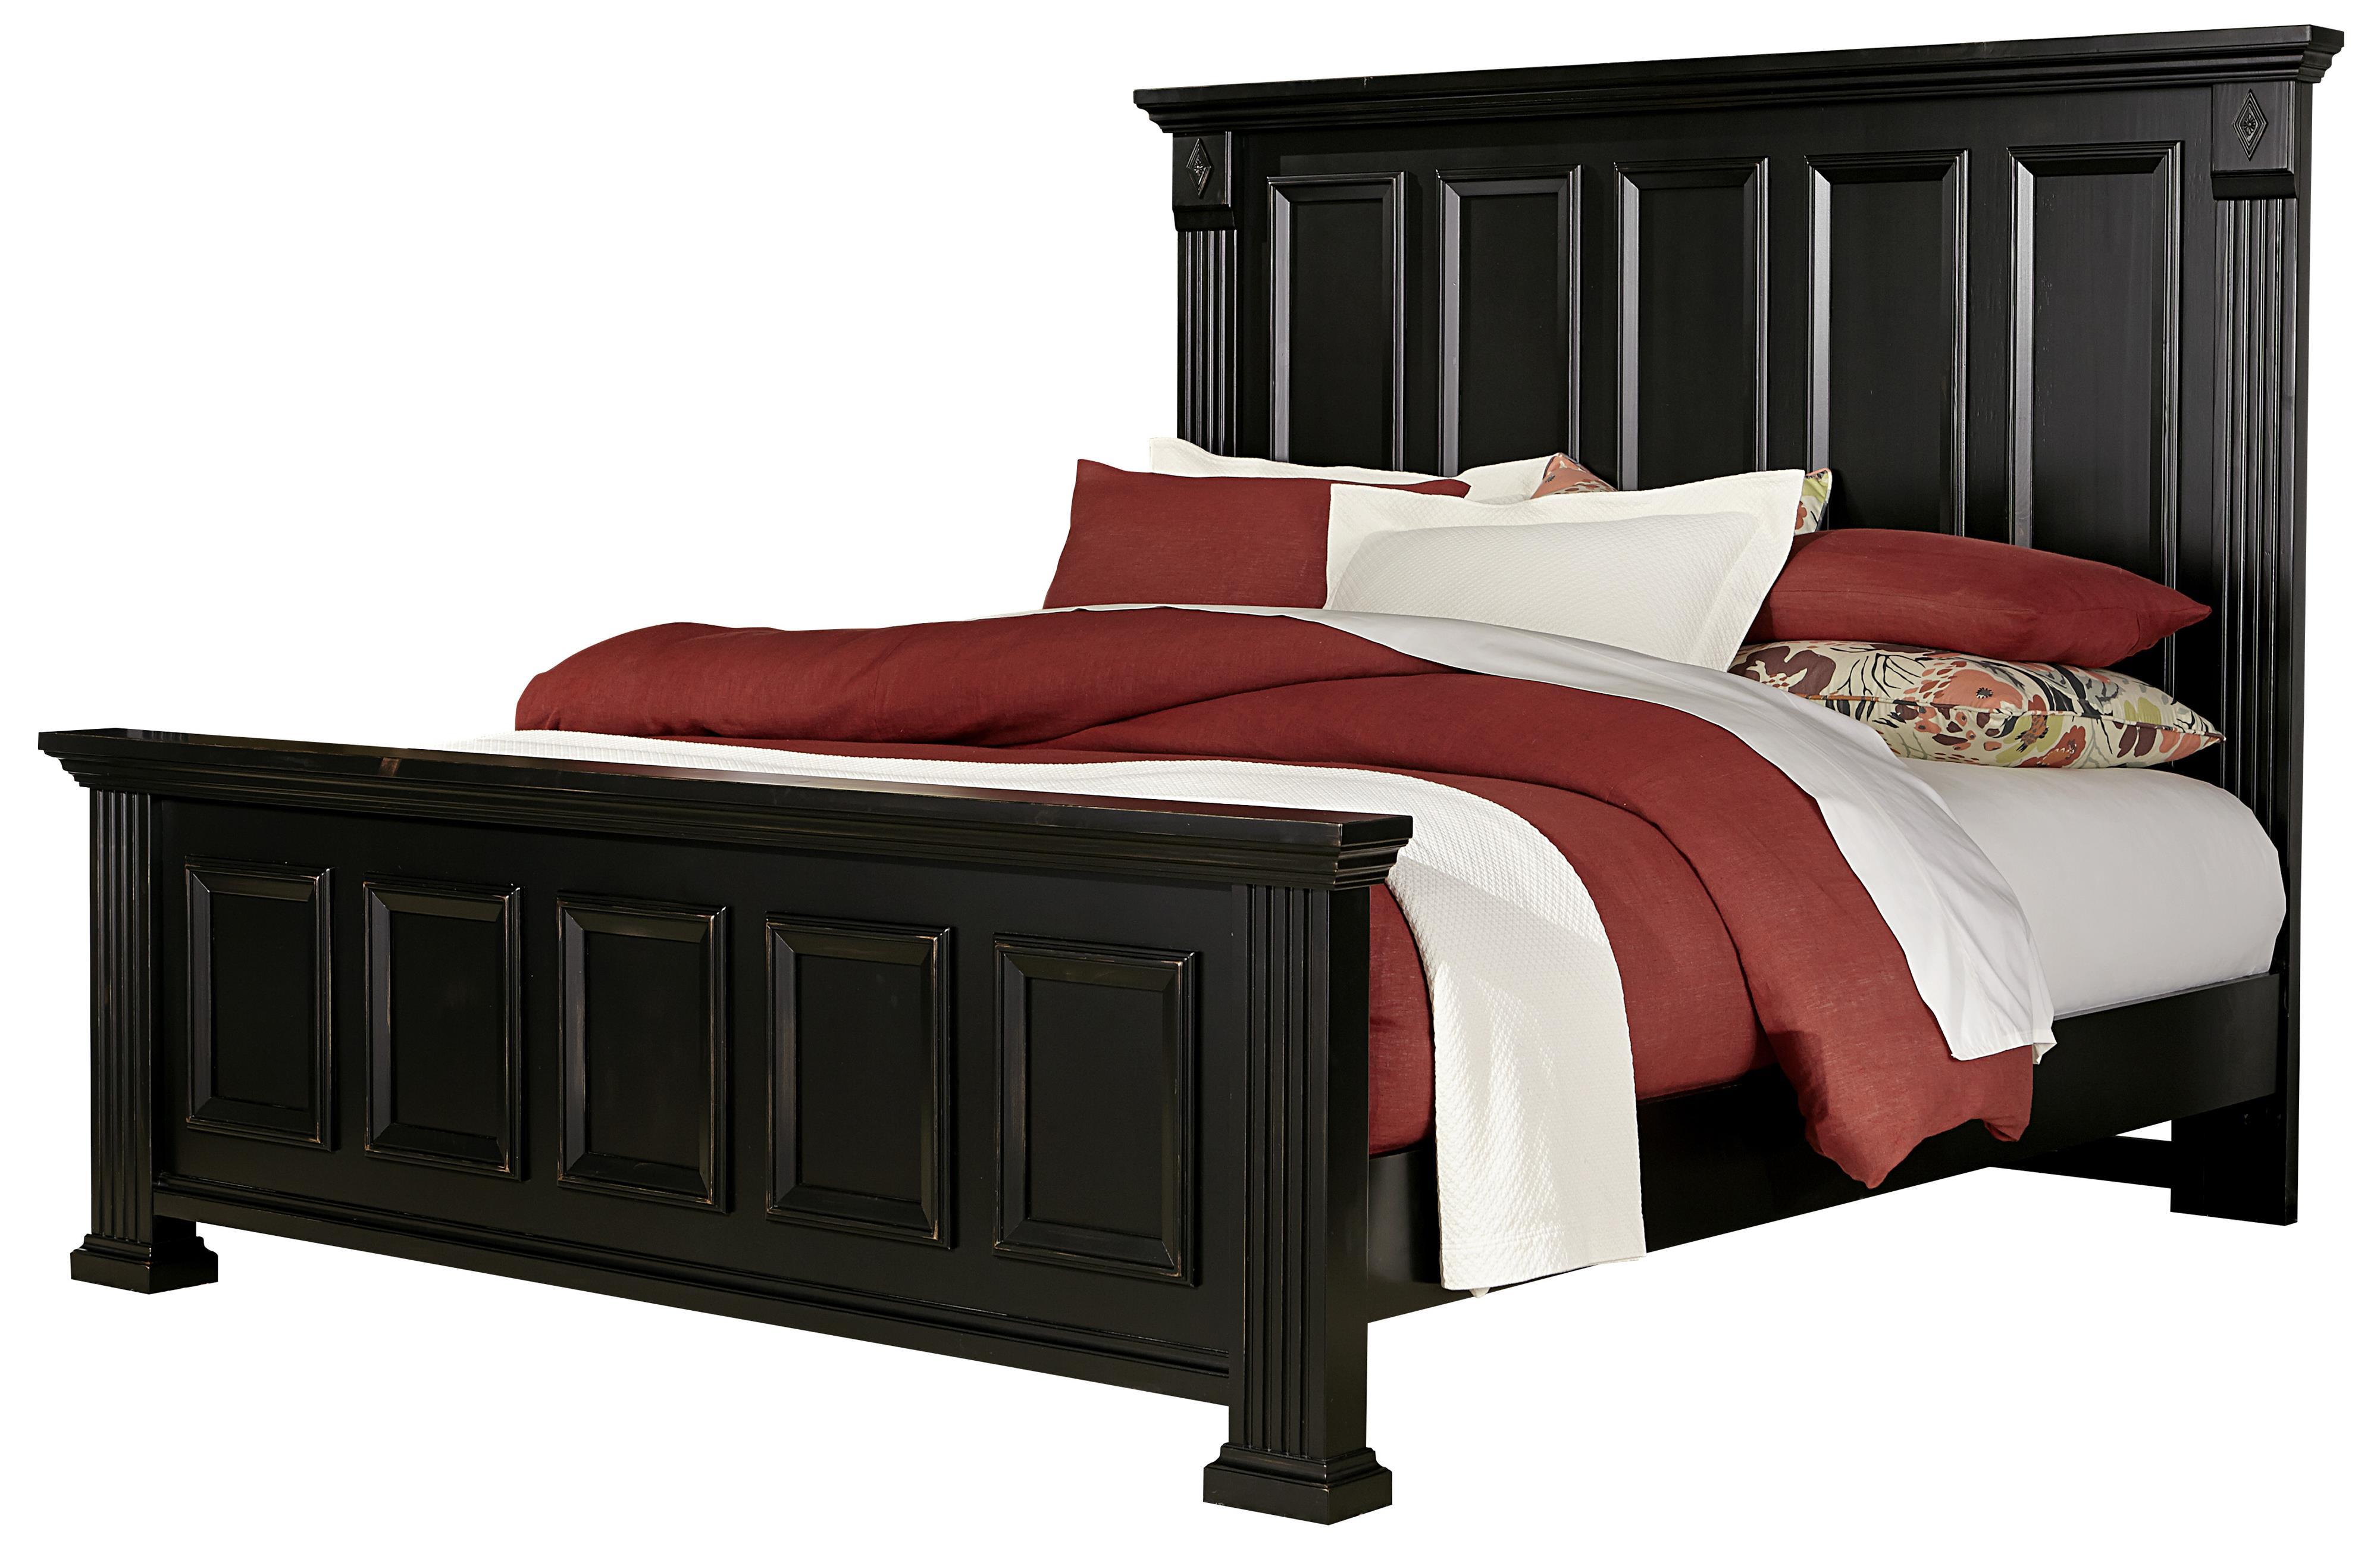 Vaughan Bassett Woodlands Queen Mansion Bed - Item Number: BB99-559+955+922